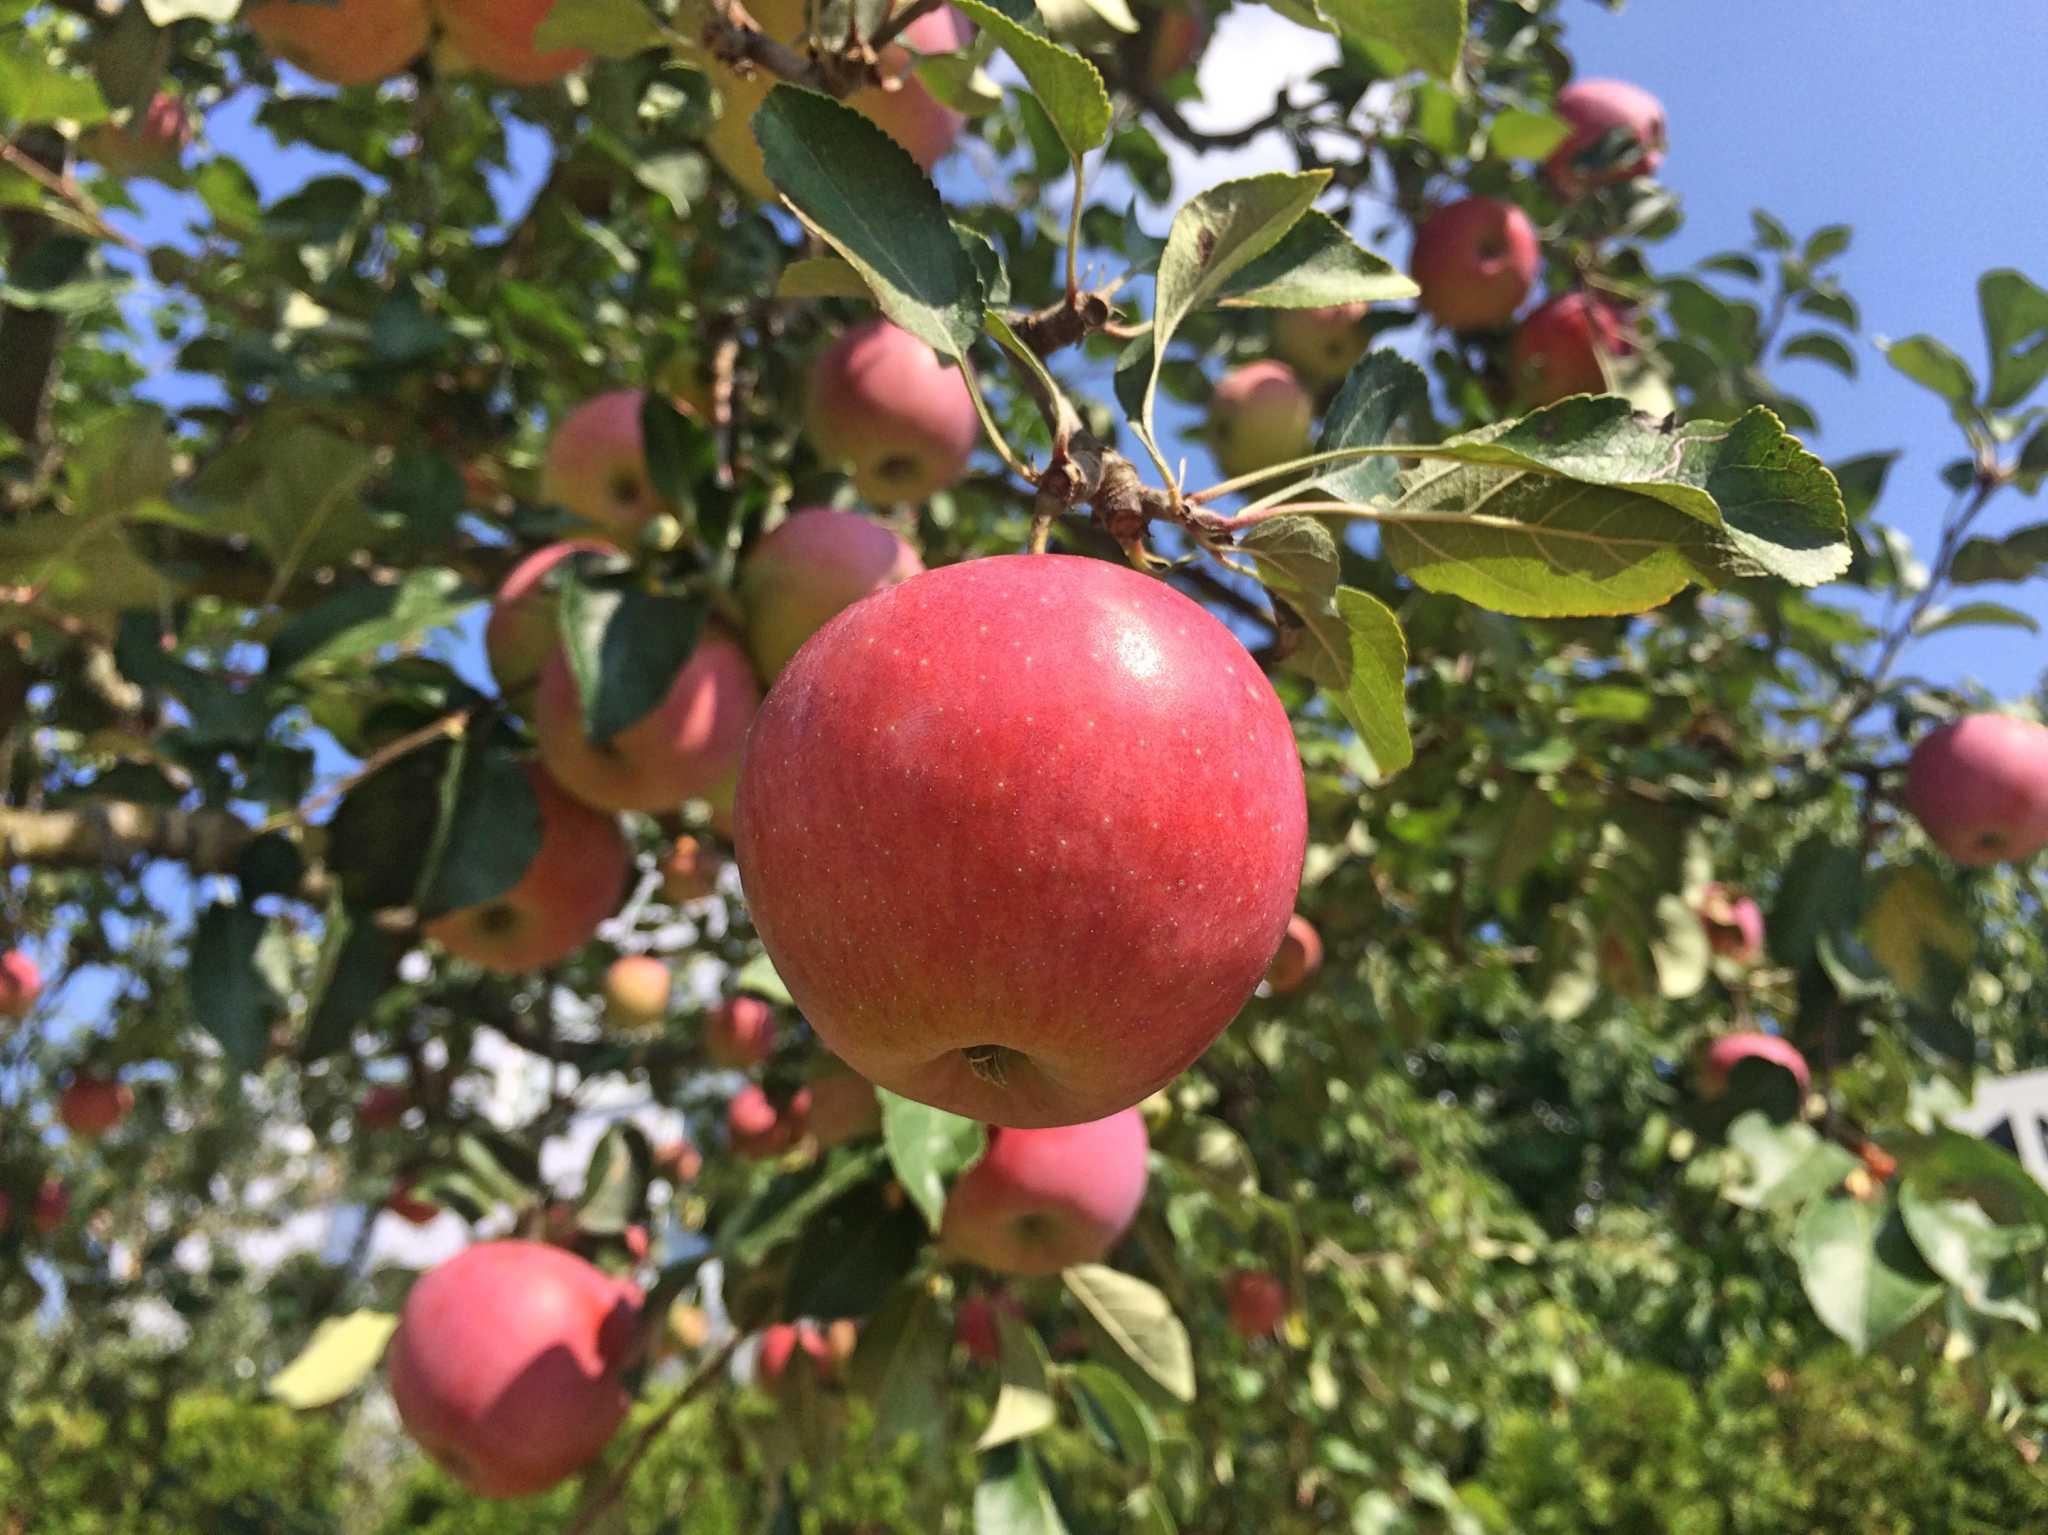 Äpfelbäume aus der Region! - Foto: Nina Härtle